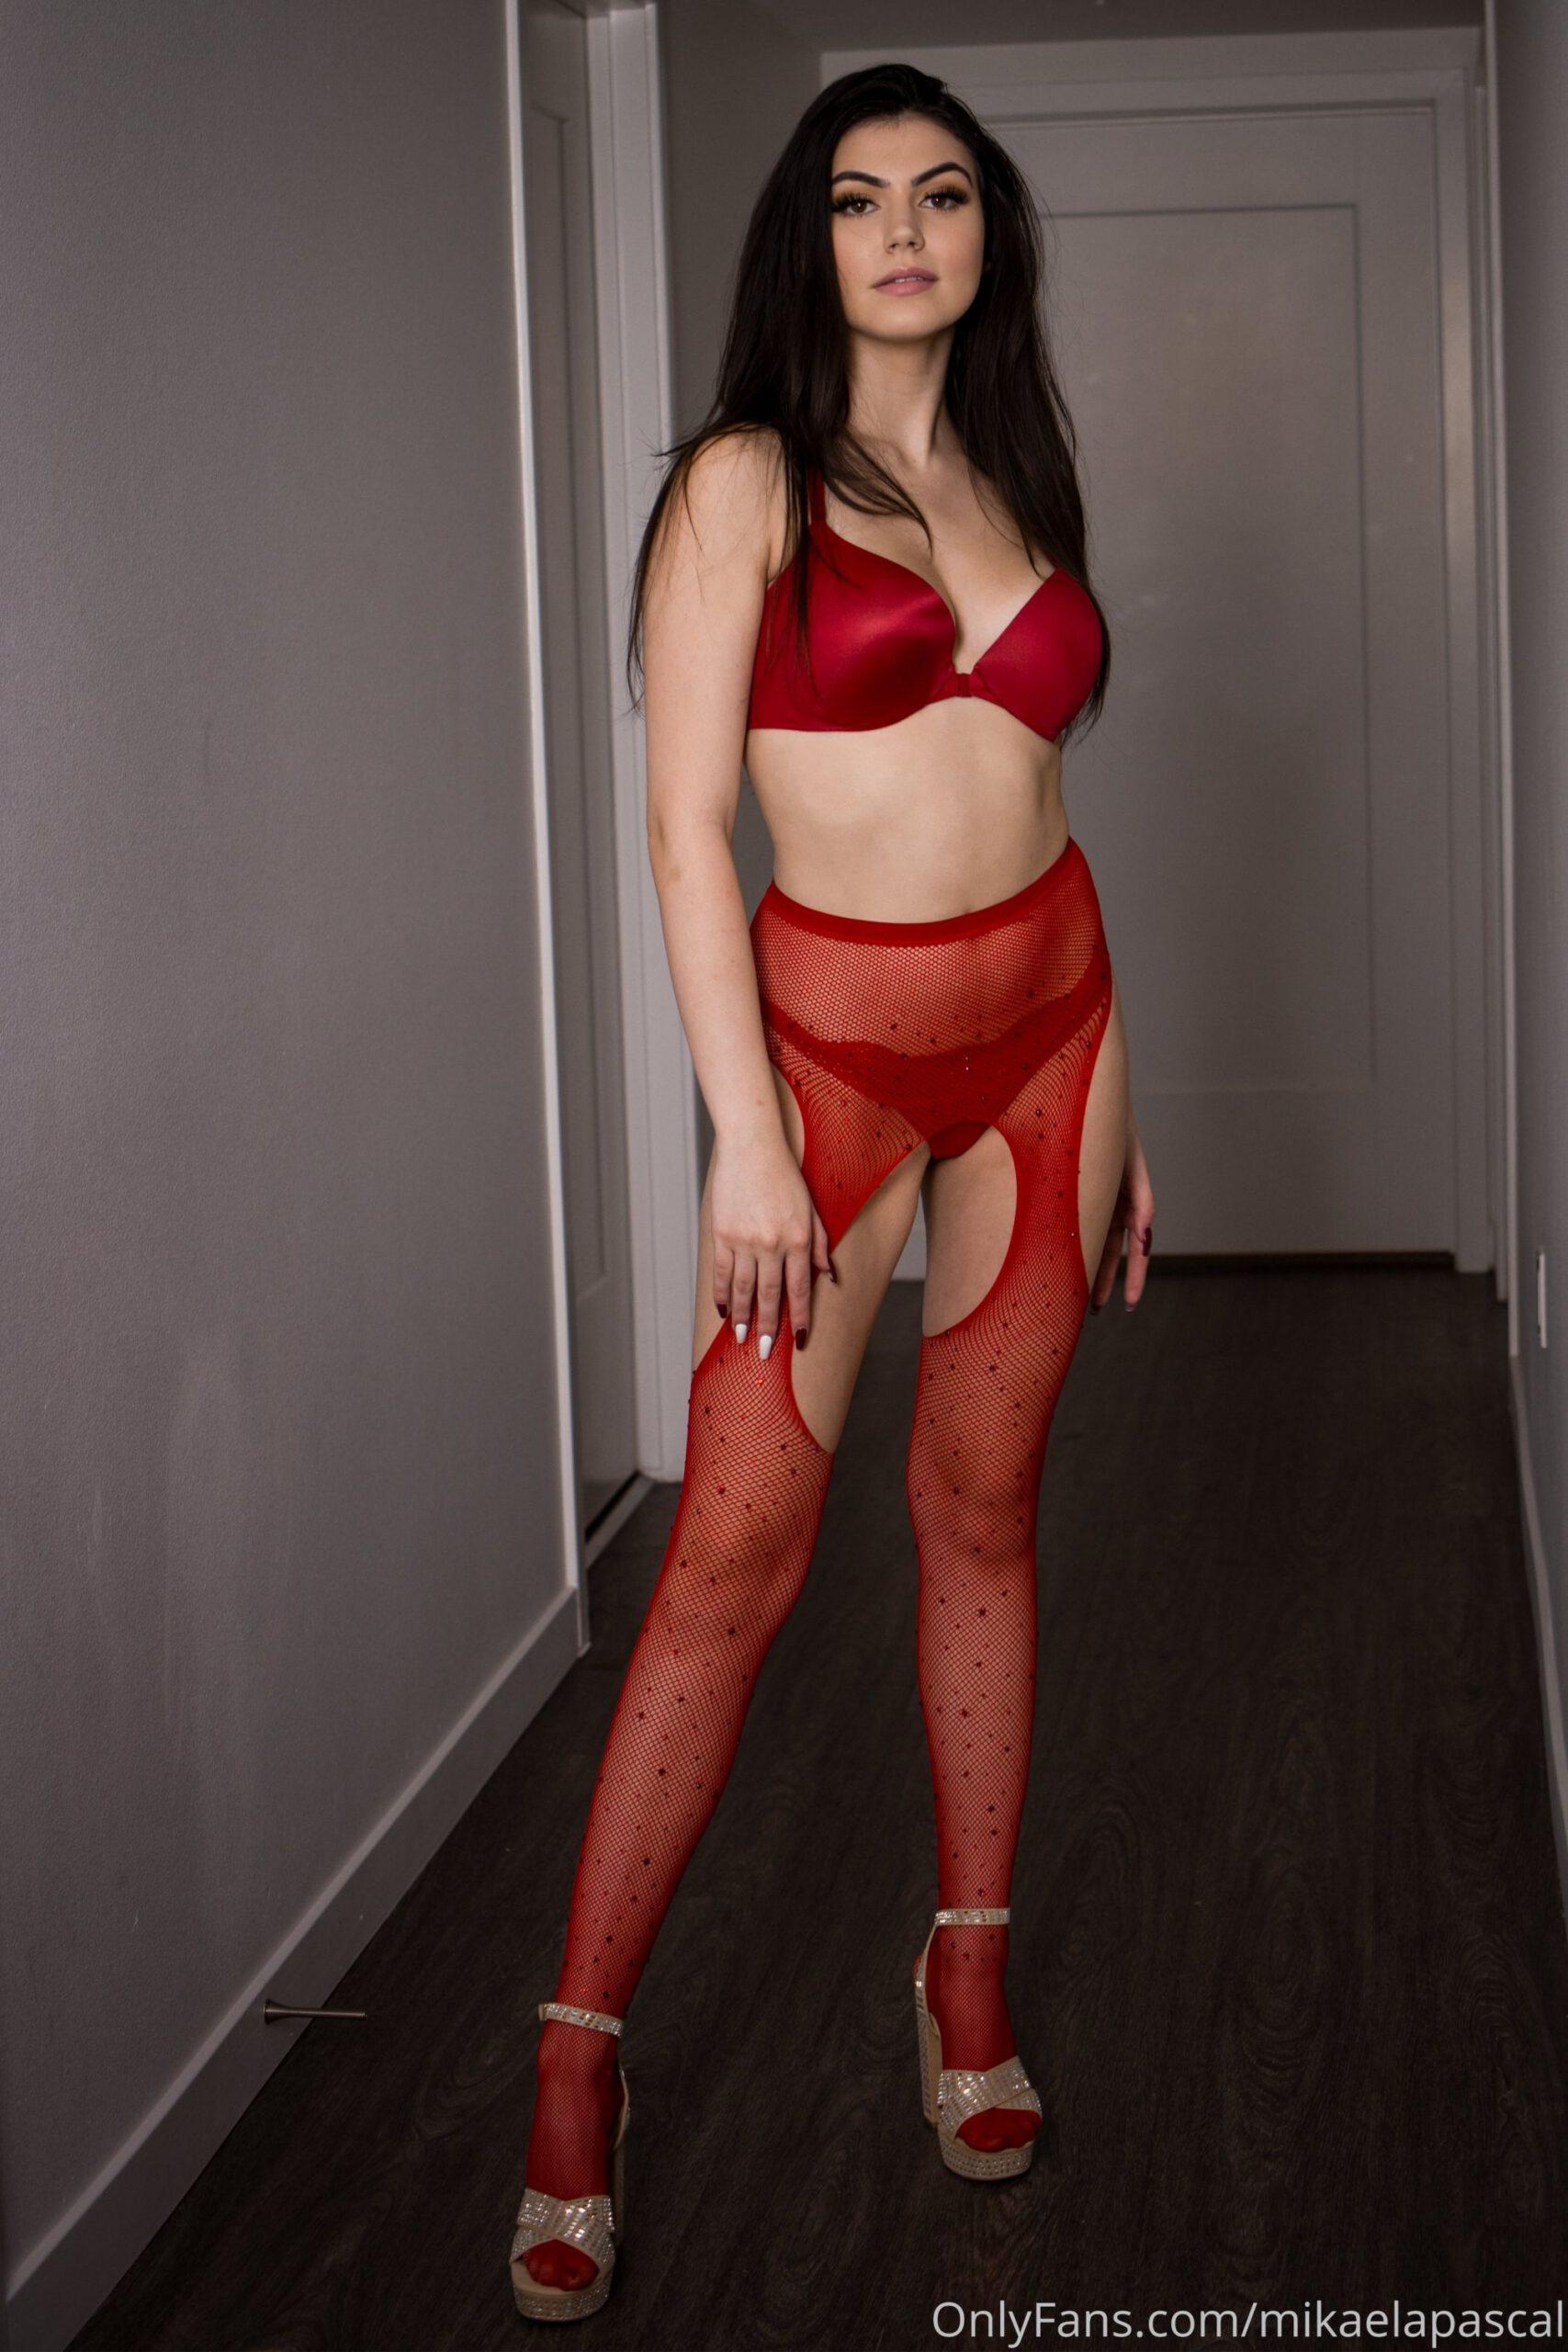 Mikaela Pascal Red Lingerie 0006